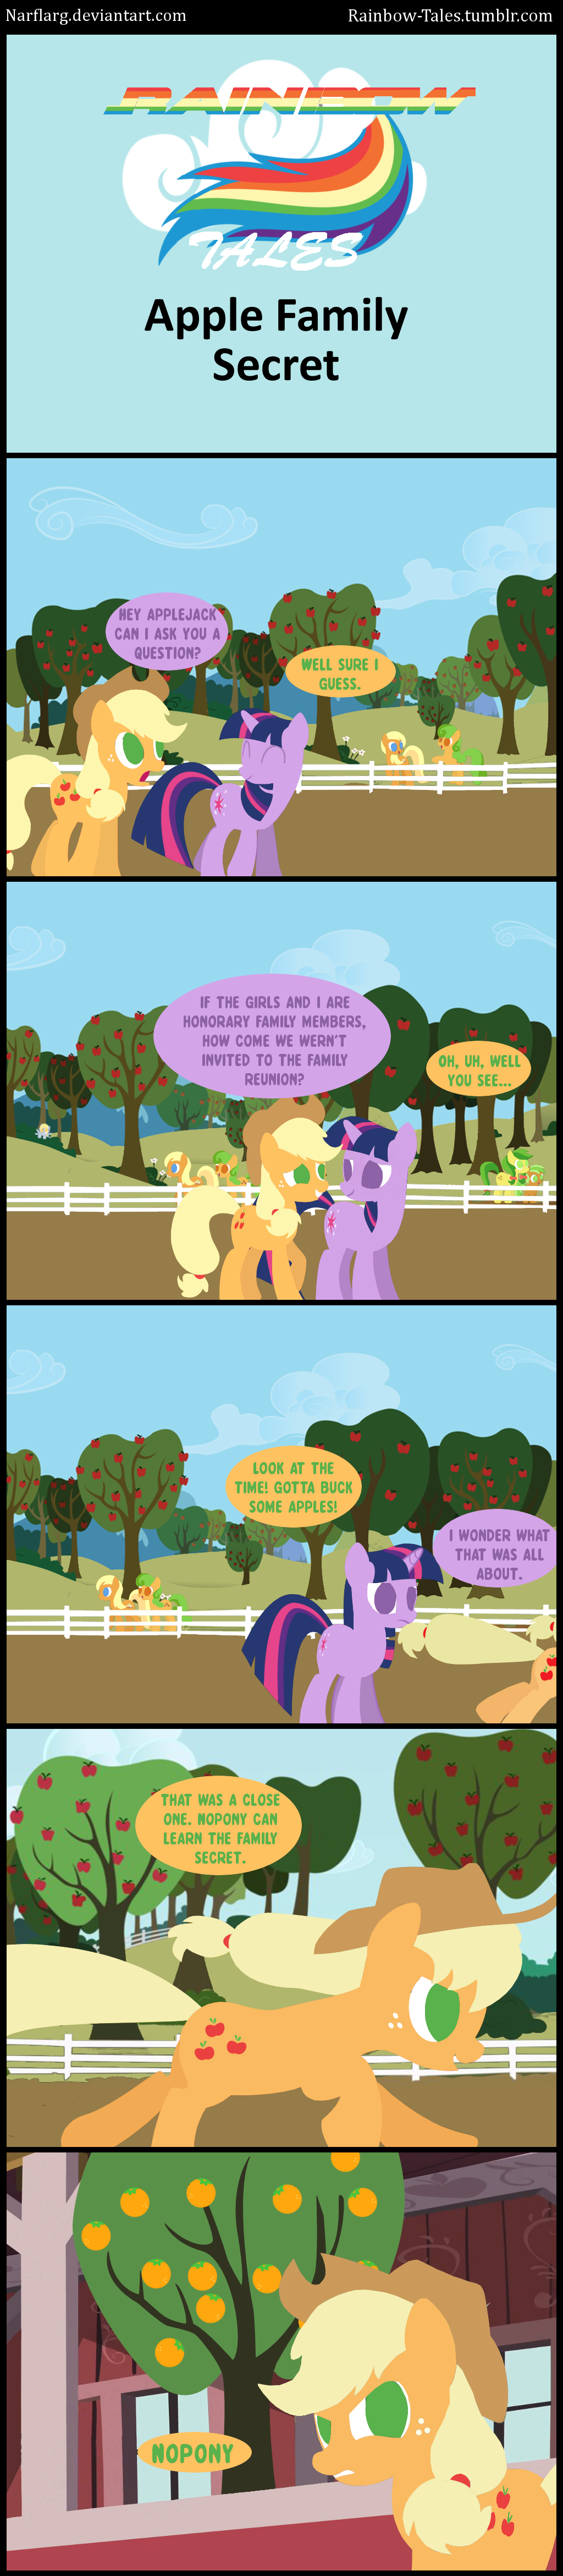 Rainbow Tales: Apple Family Secret by Narflarg